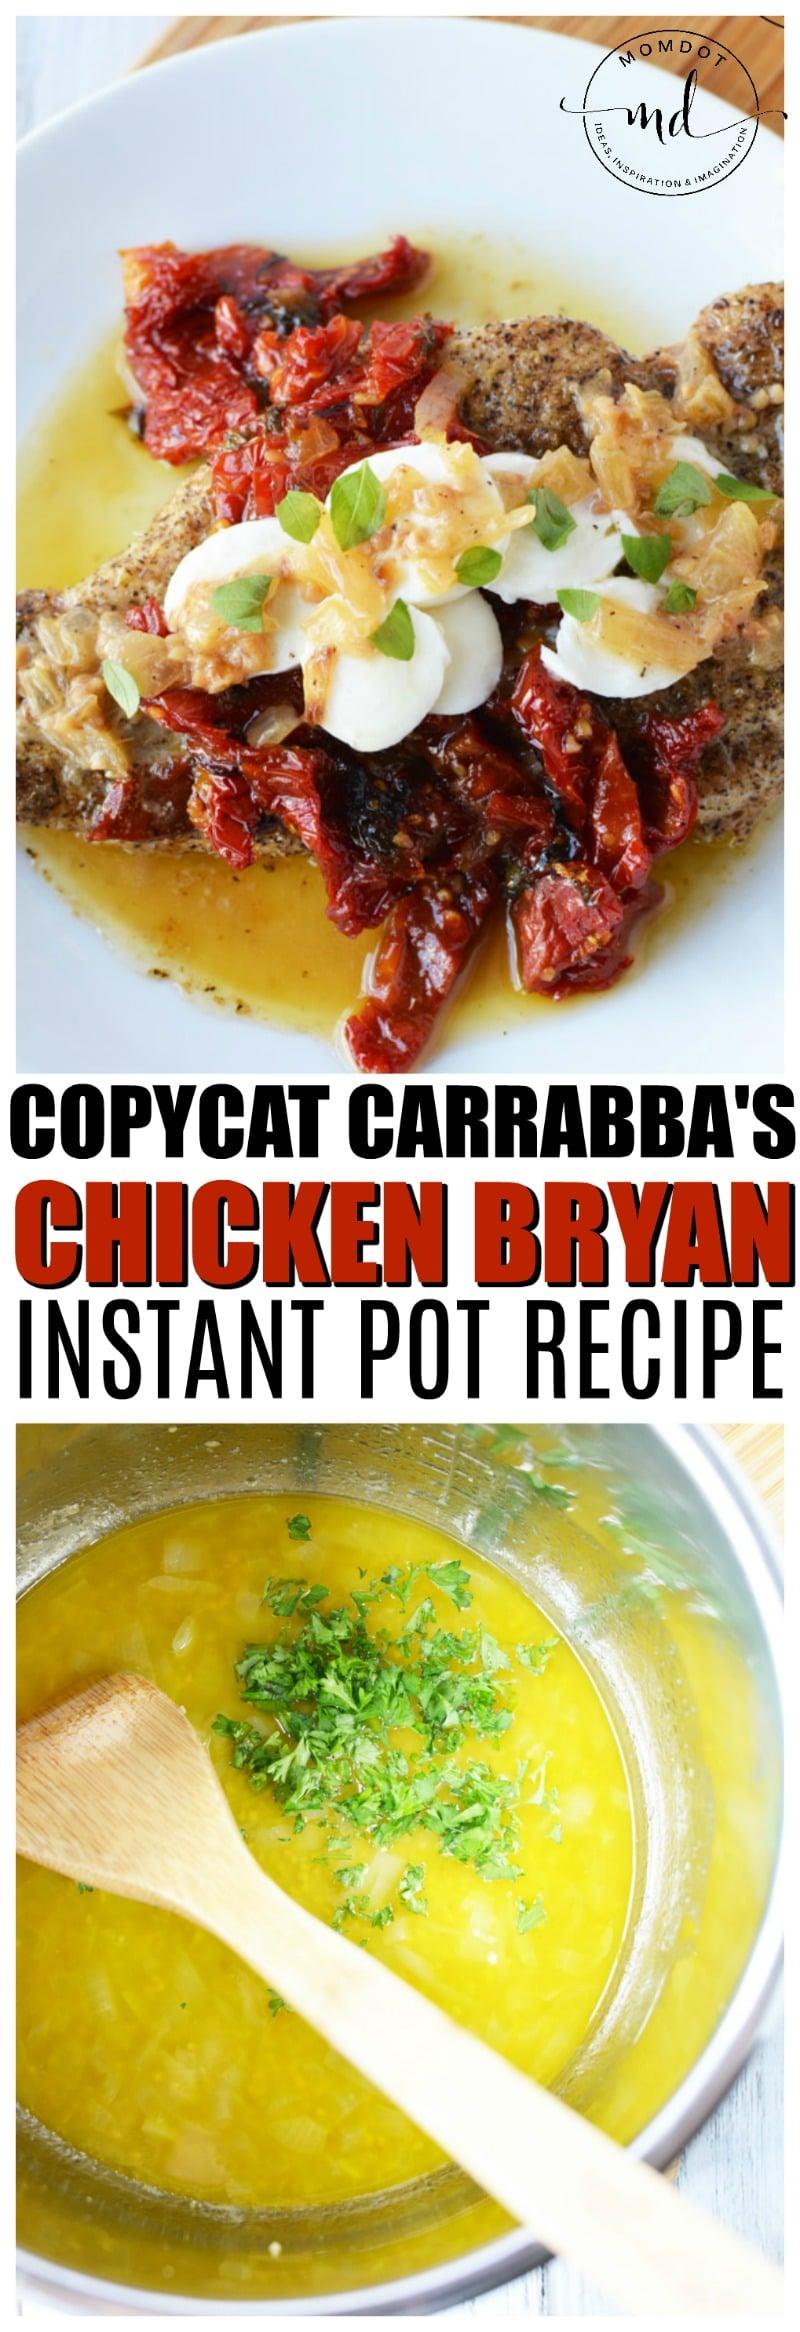 carrabbas copycat